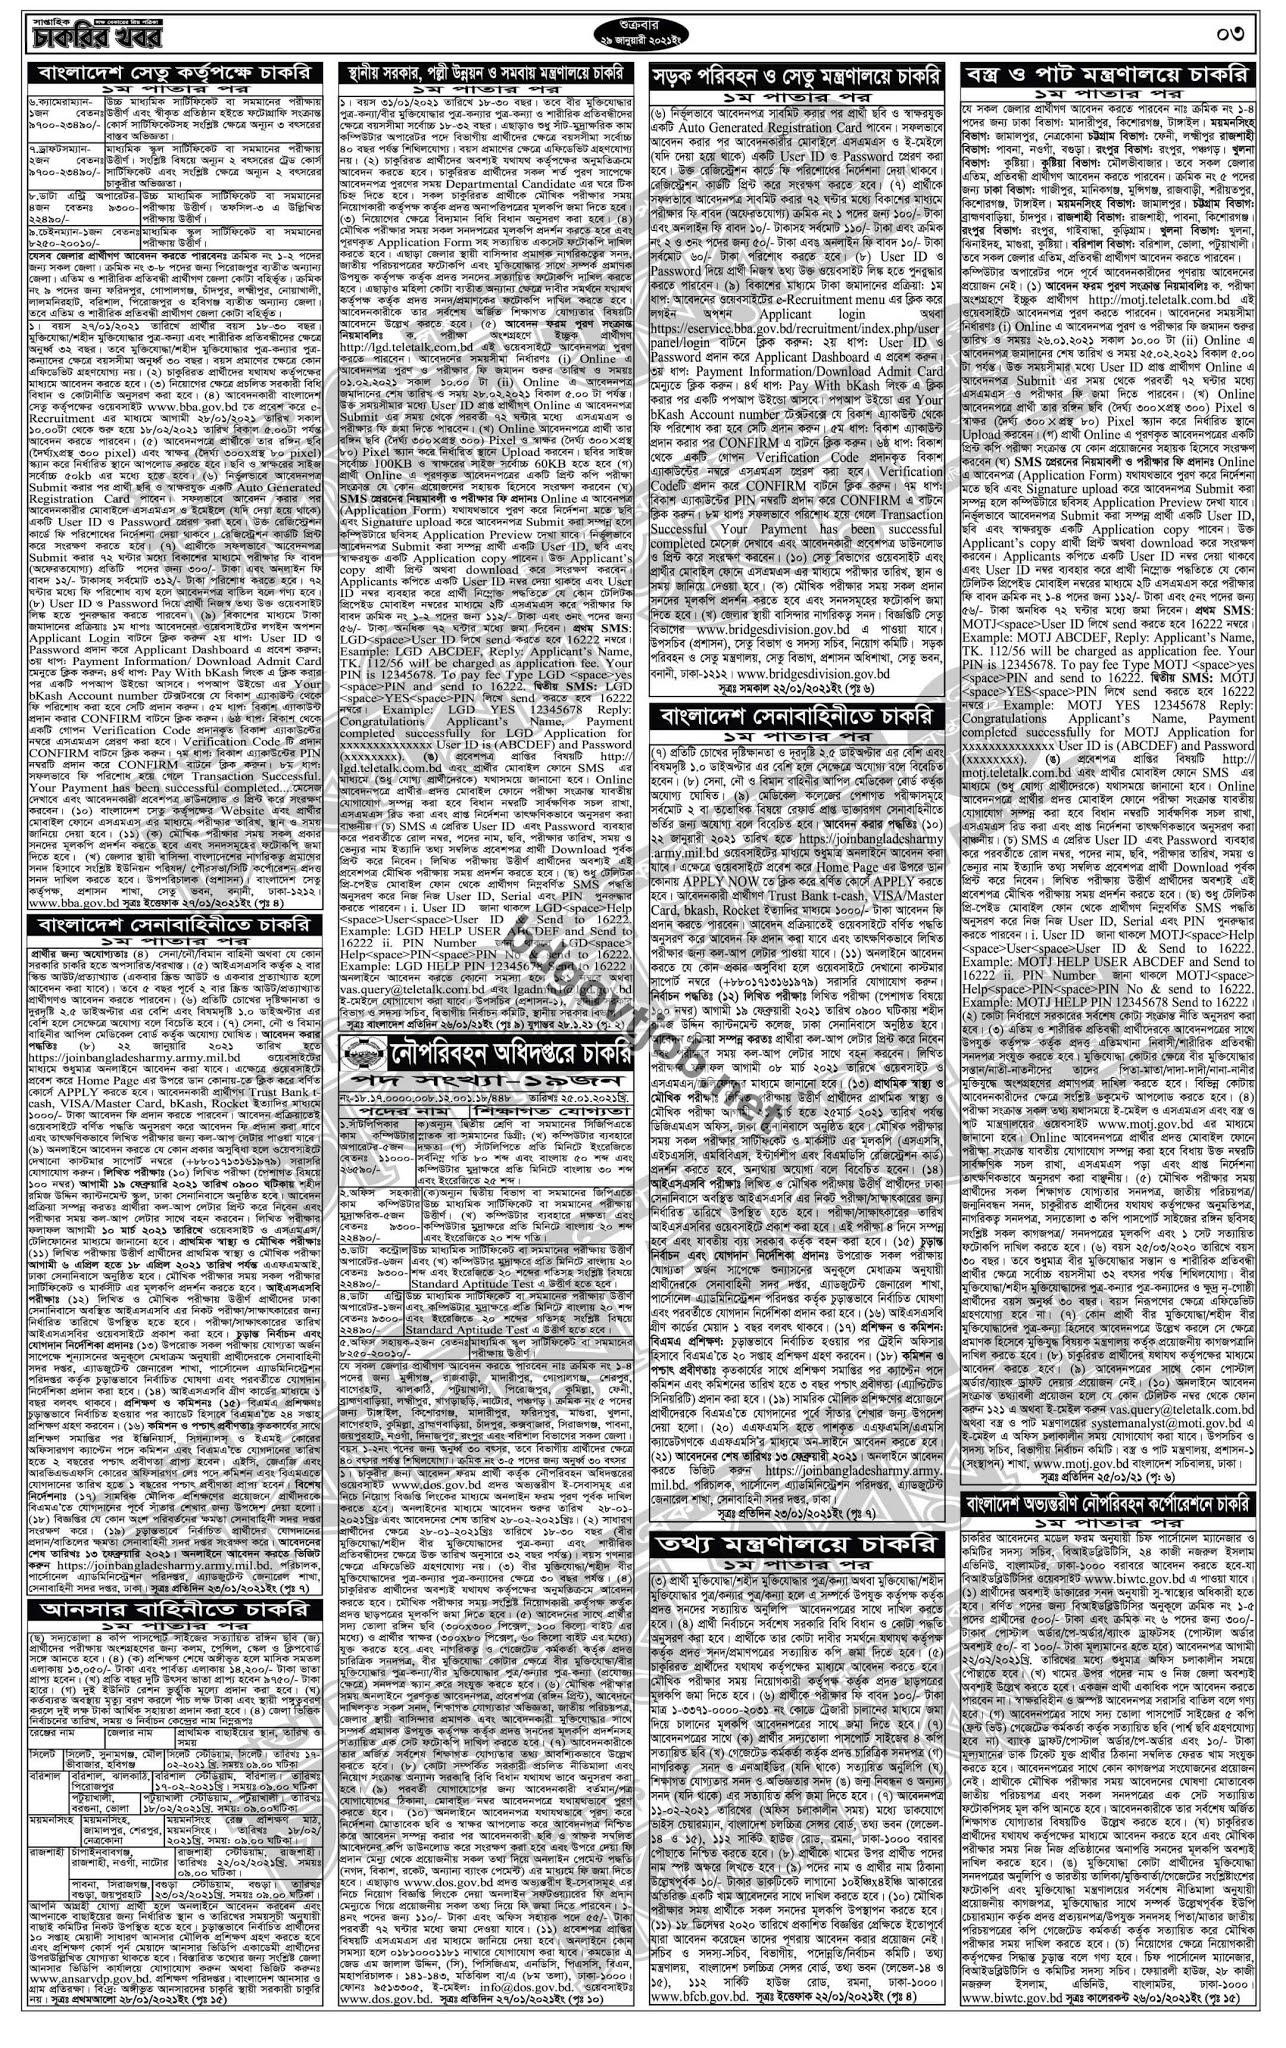 saptahik chakrir khobor potrika 5 february 2021 - সাপ্তাহিক চাকরির খবর পত্রিকা ০৫ ফেব্রুয়ারি ২০২১ - weekly chakrir khobor newspaper 05 february 2021